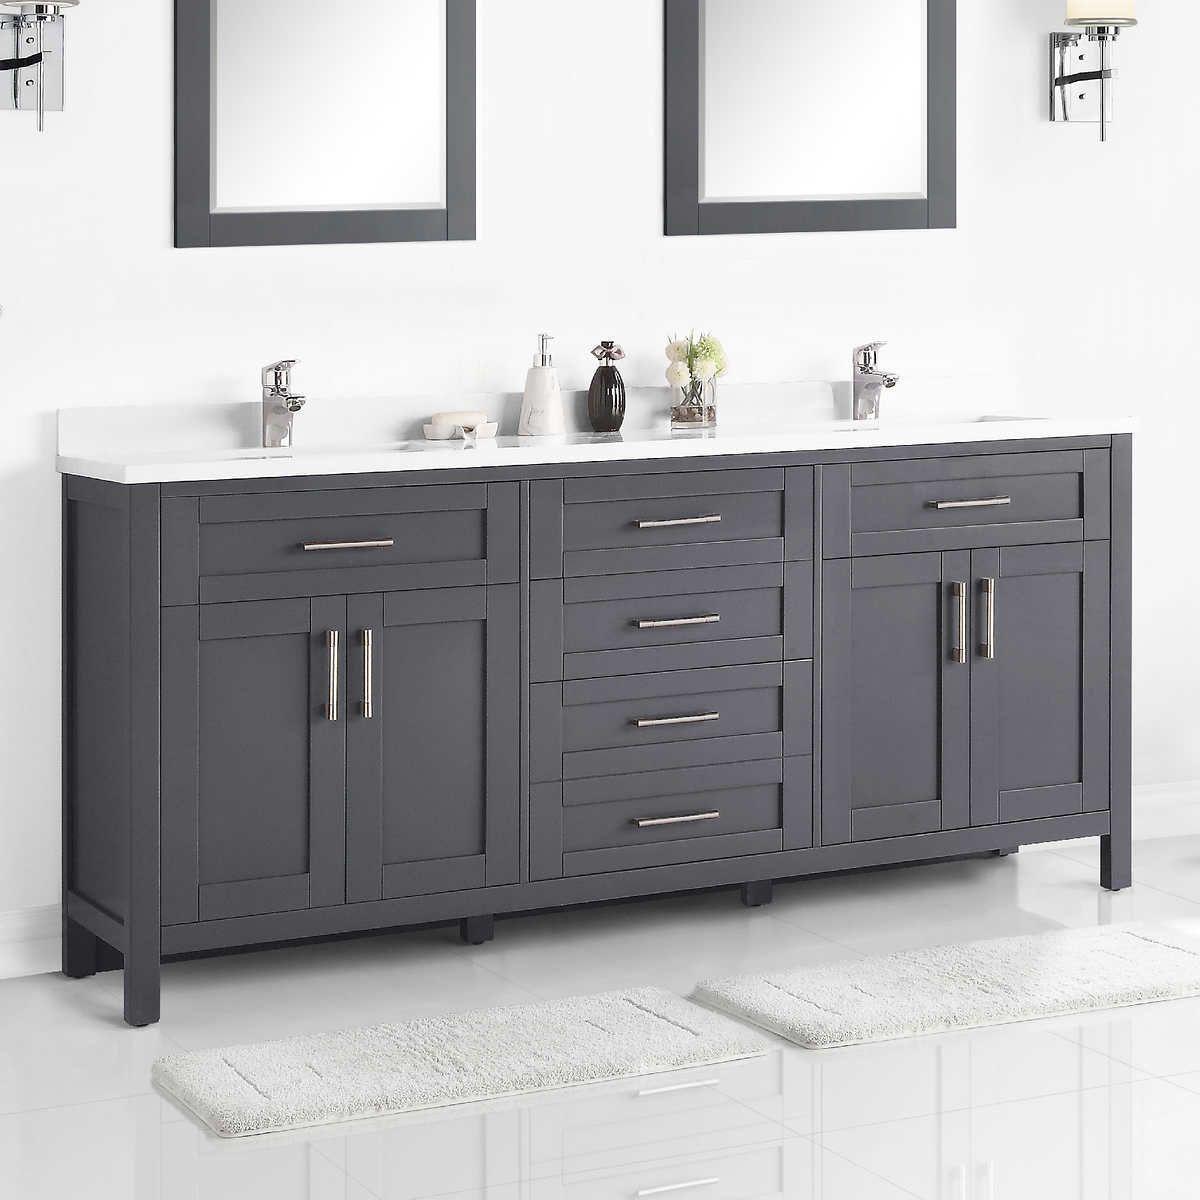 Ove Decors Lakeview 72 Vanity In 2021 Bathroom Vanity Bathrooms Remodel Contemporary Bathroom Designs